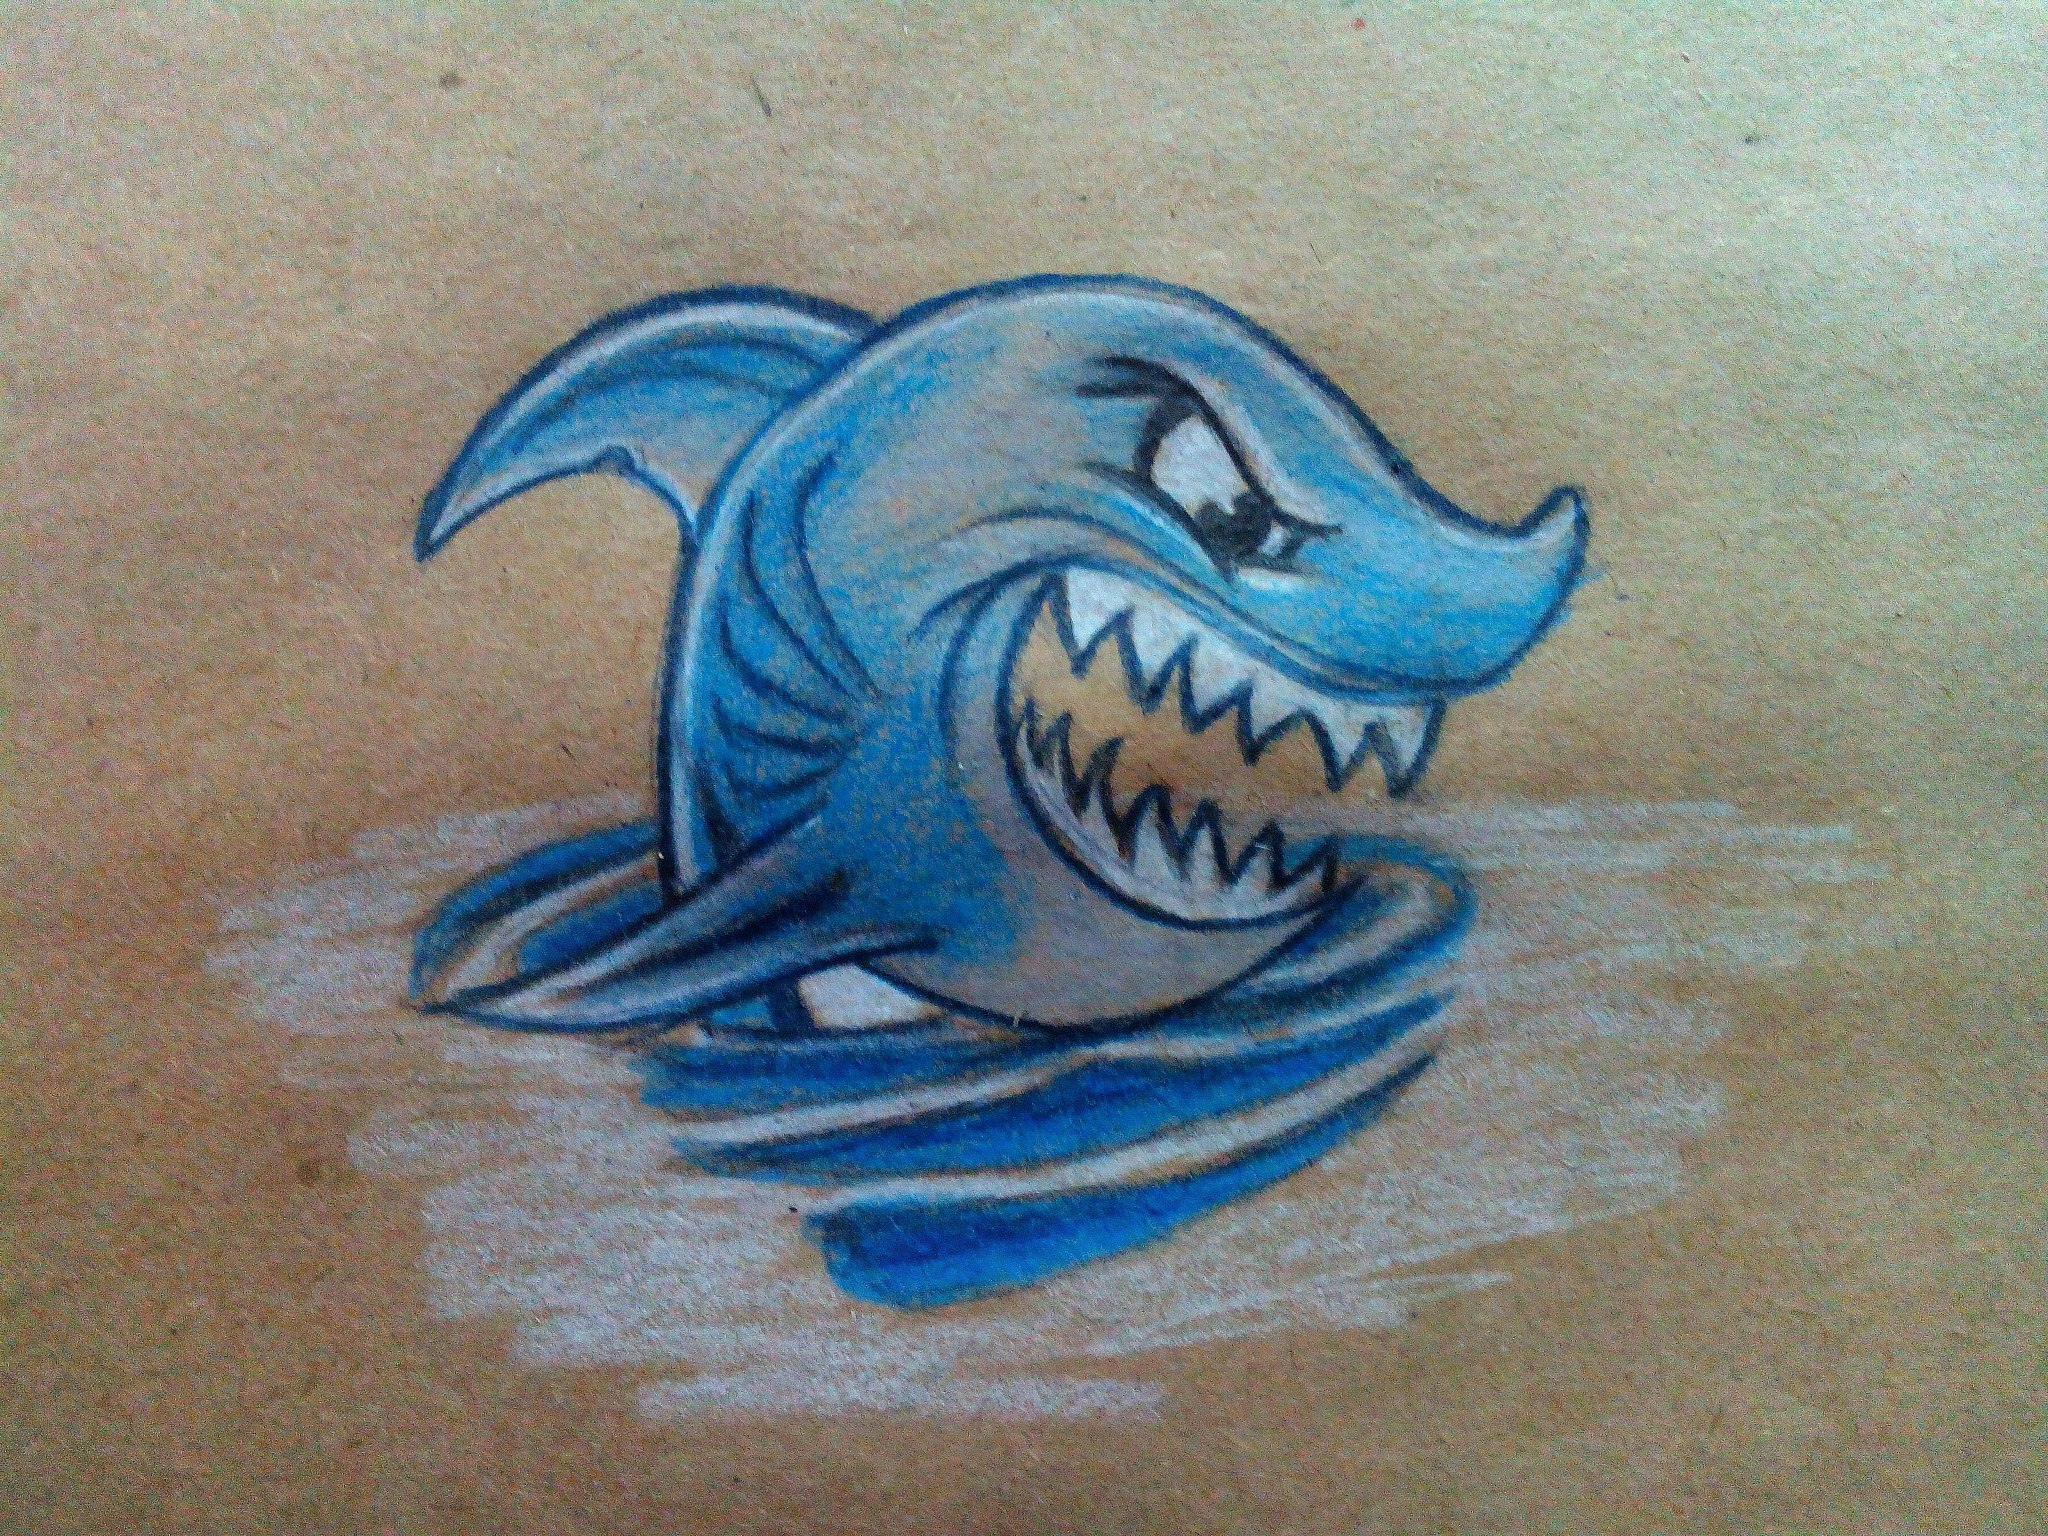 Как нарисовать акулу карандашом поэтапно?